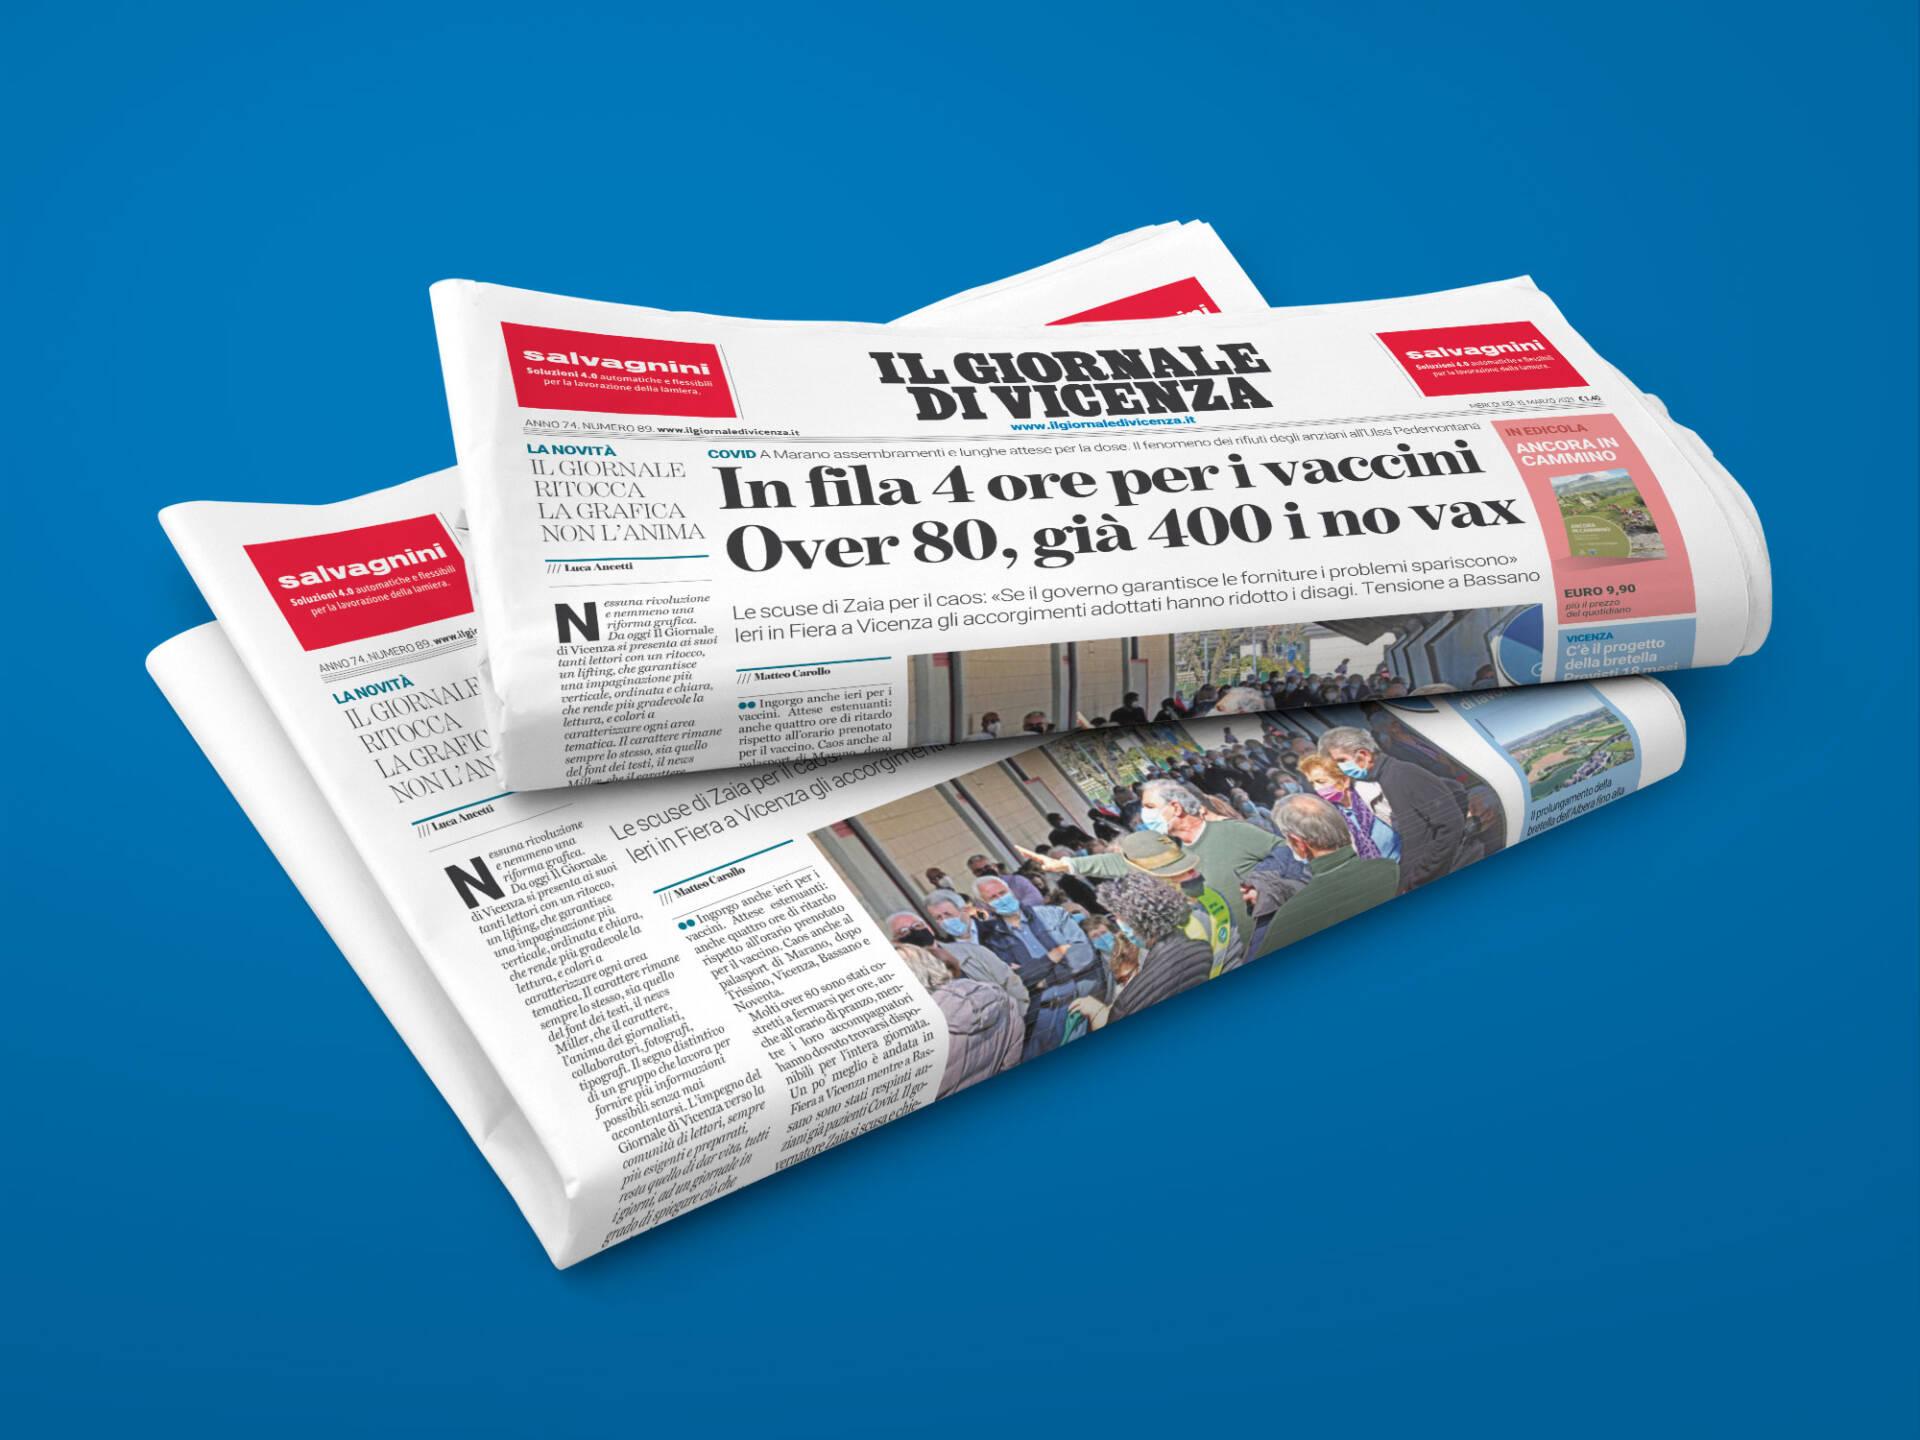 Il-Gionrale-Di-Vicenza-01-Wenceslau-News-Design-2021